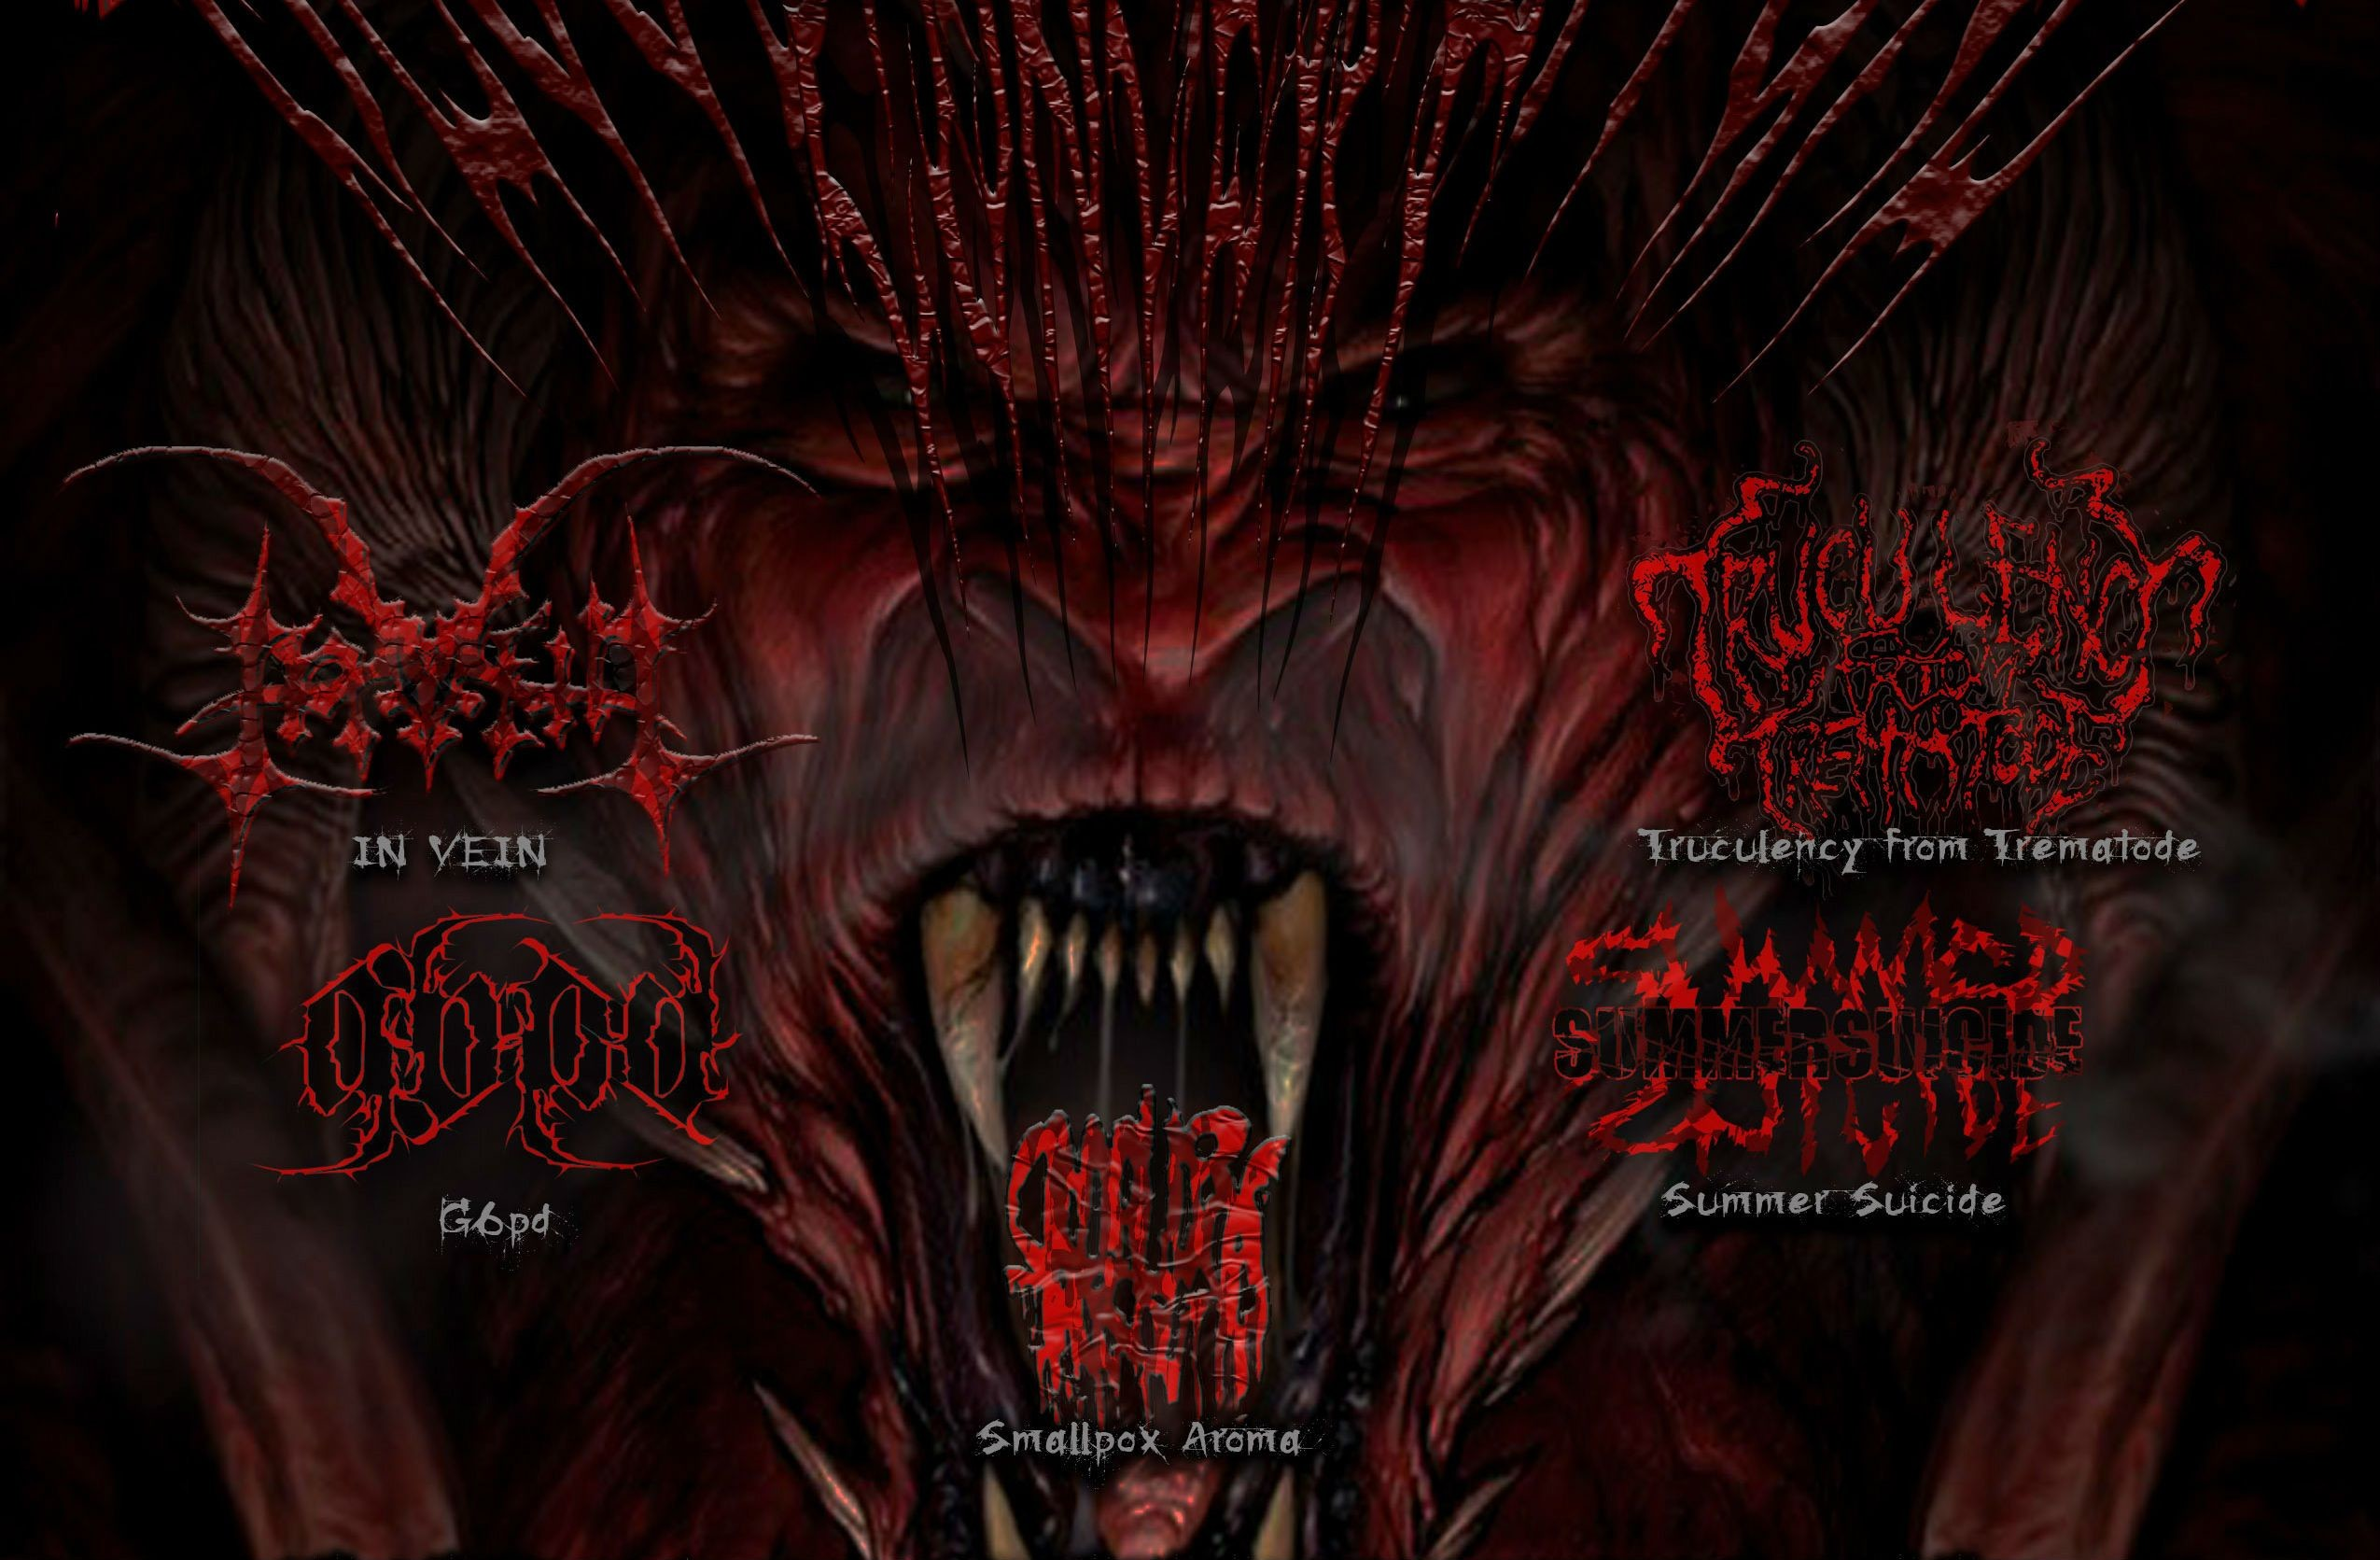 Death metal brutal wallpaper wallpapertag - Death metal wallpaper ...